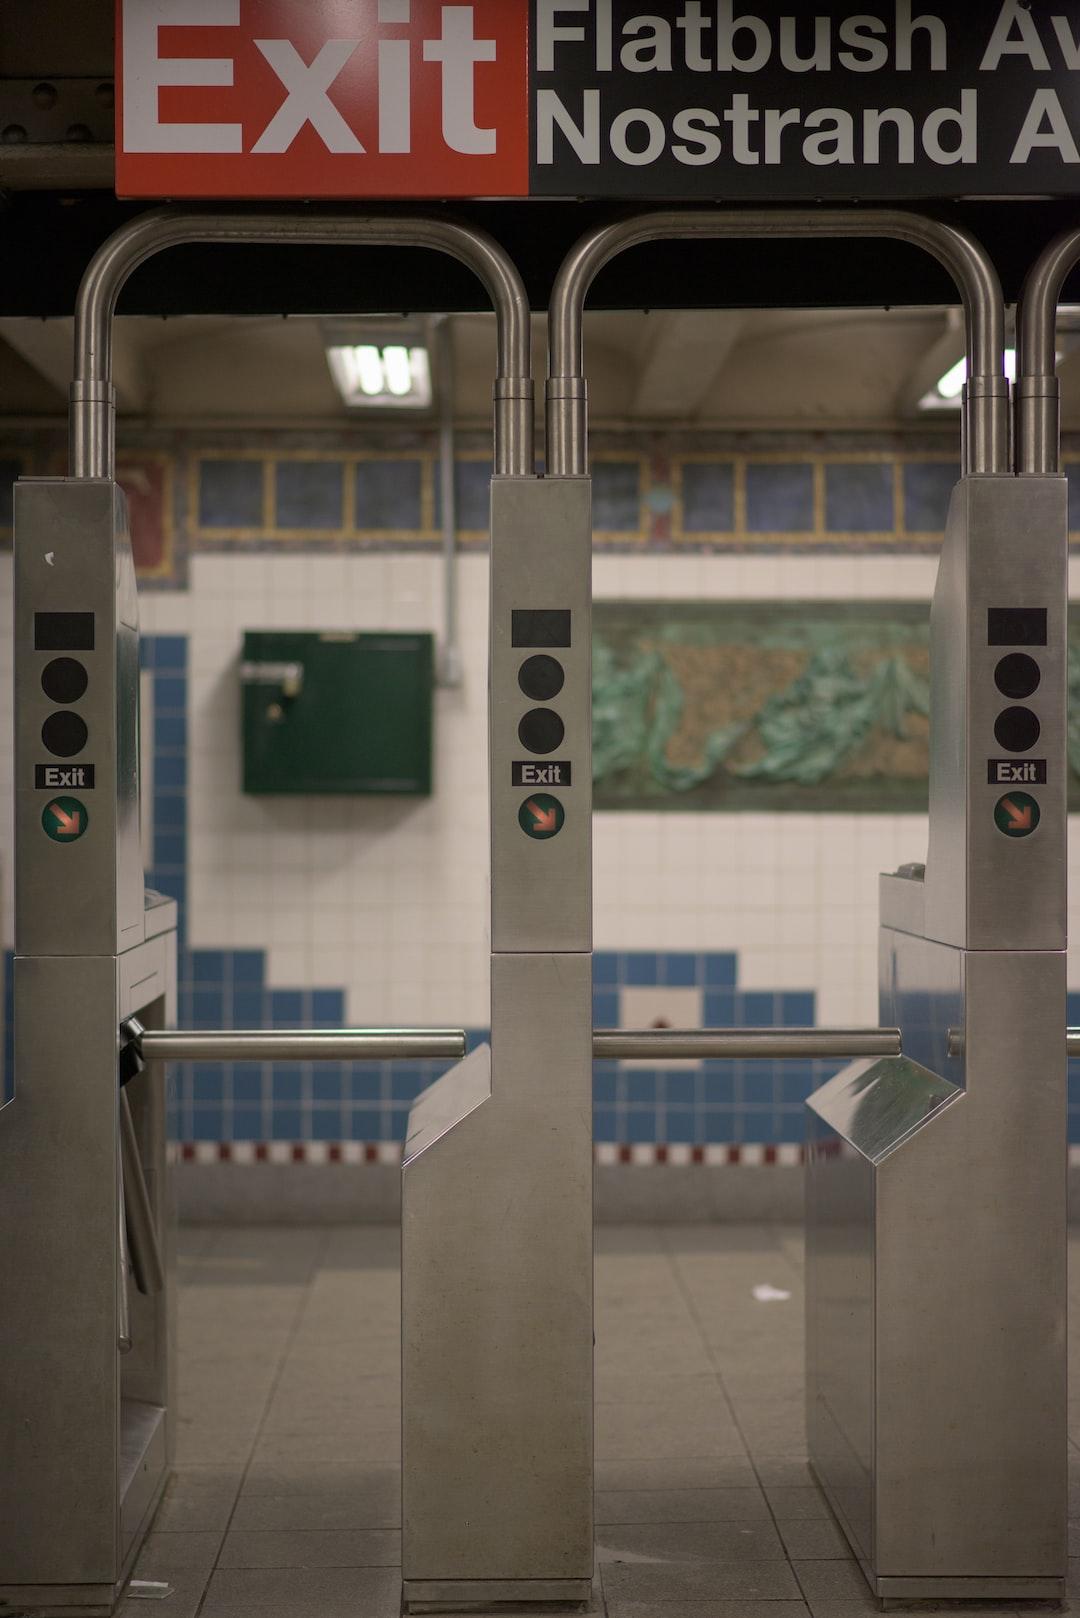 Subway turnstile in Brooklyn, NY.